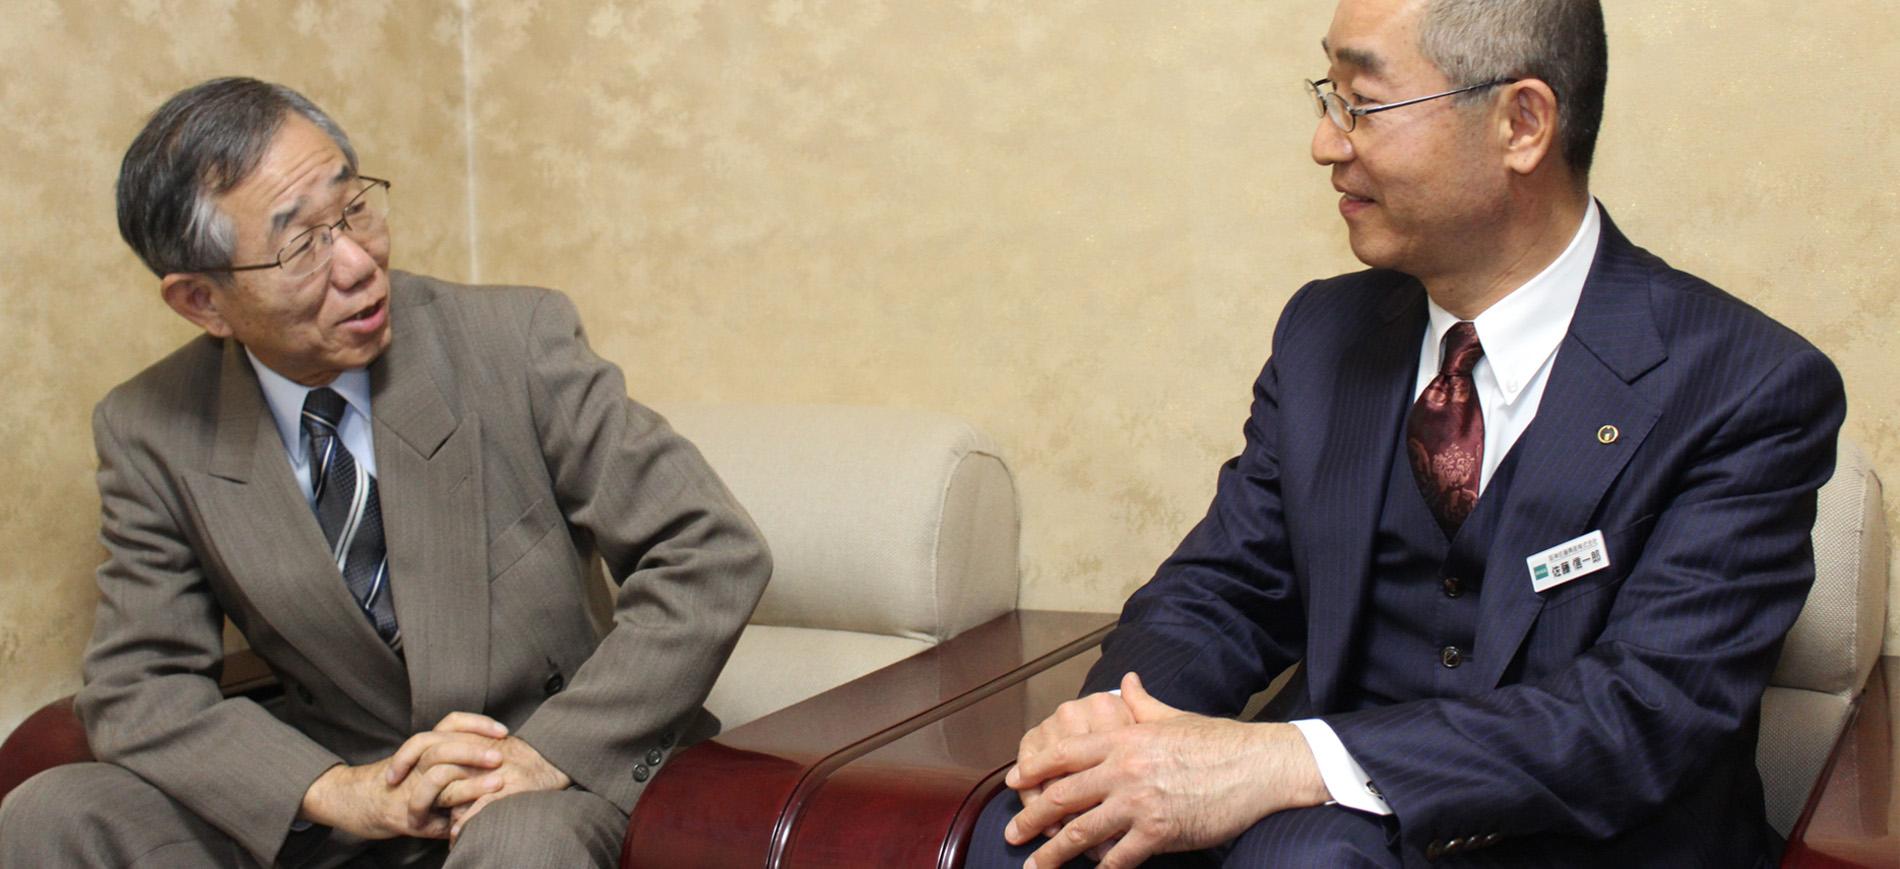 神戸老人ホーム 理事・統括施設長様と対談